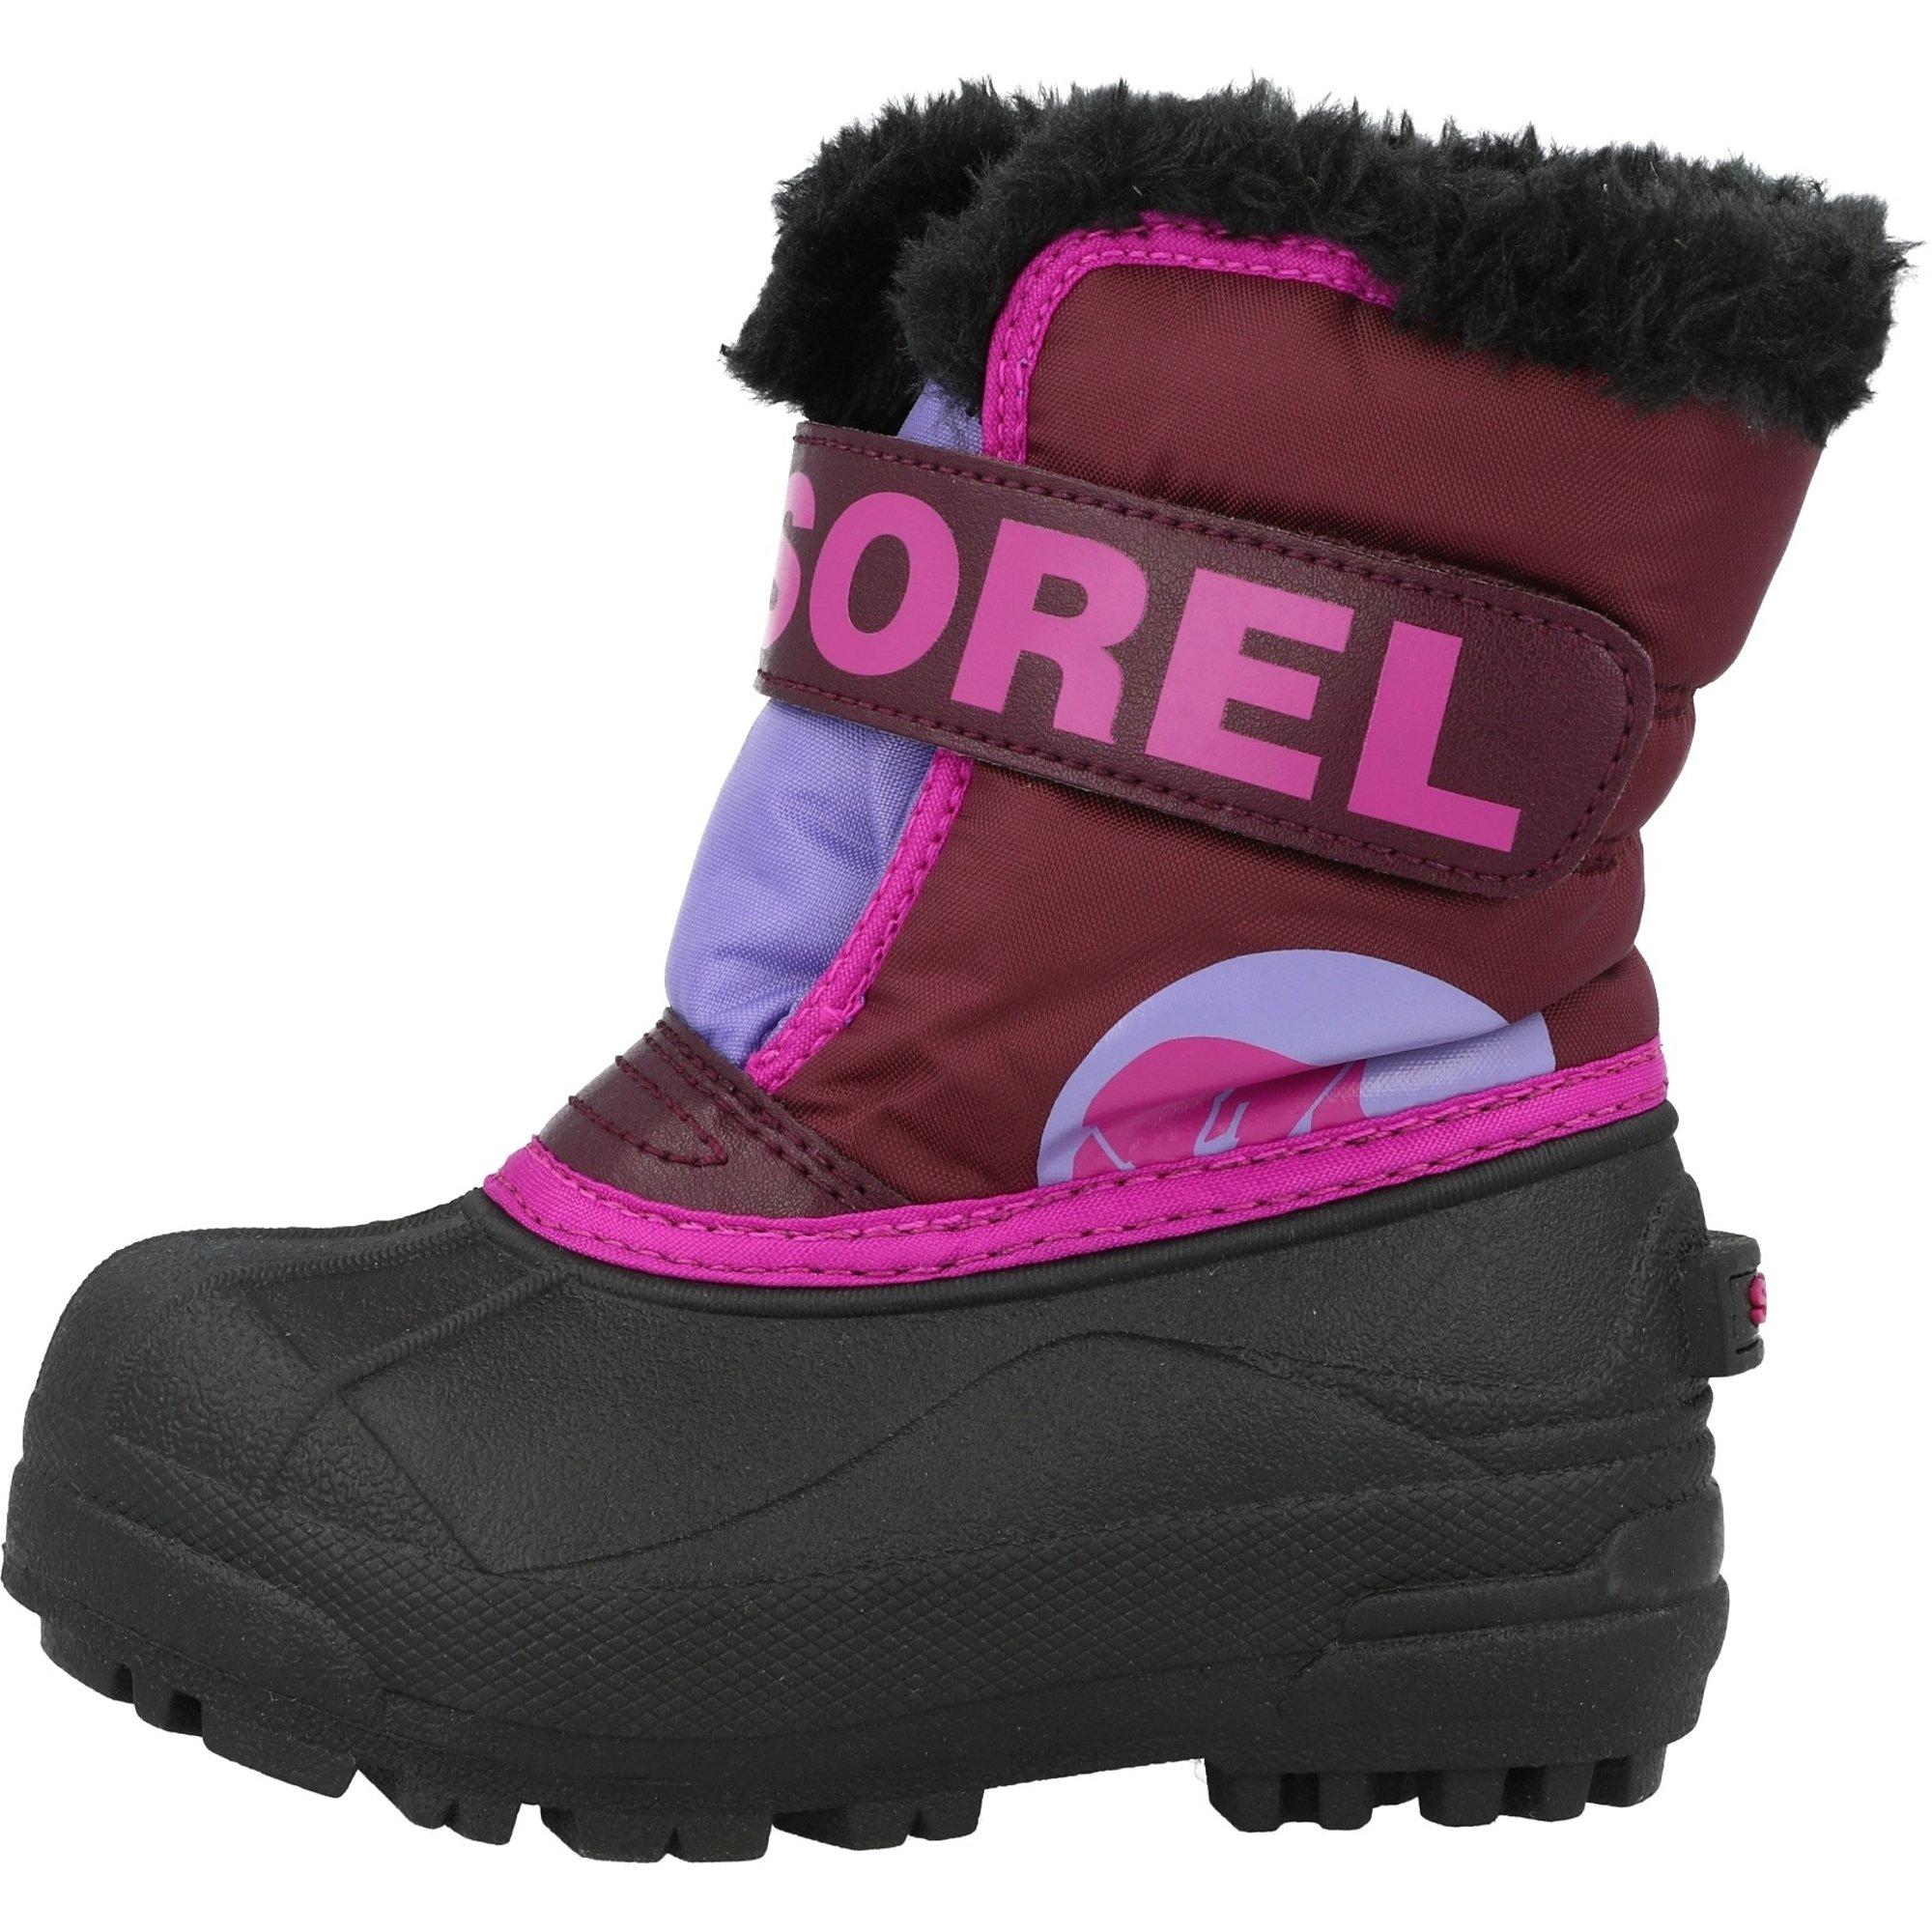 Sorel Snow Commander Girls Snow Boots Purple Dahlia